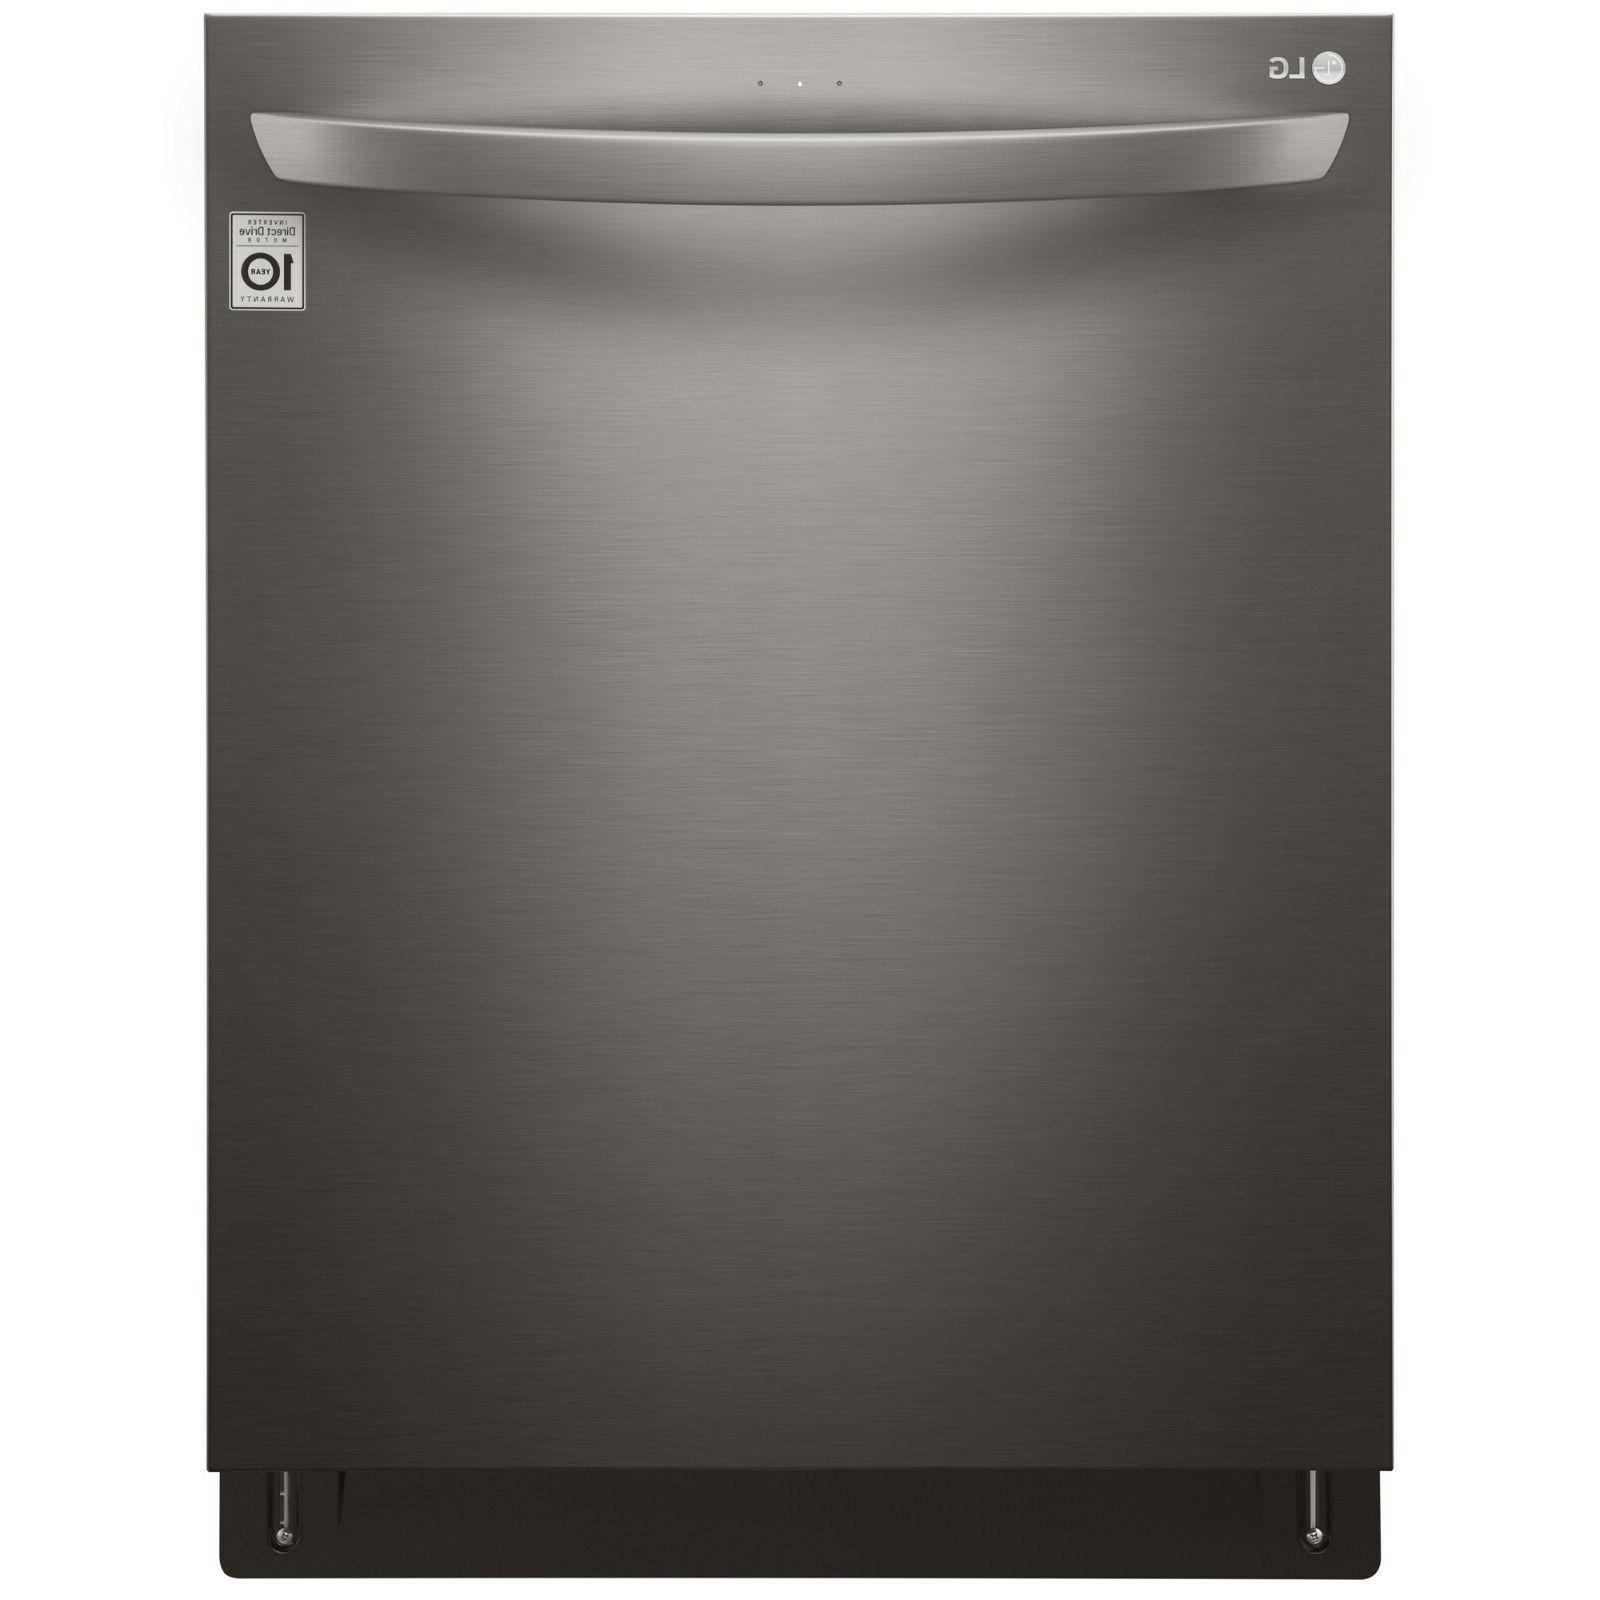 ldt5665bd 24 inch fully integrated quadwash dishwasher